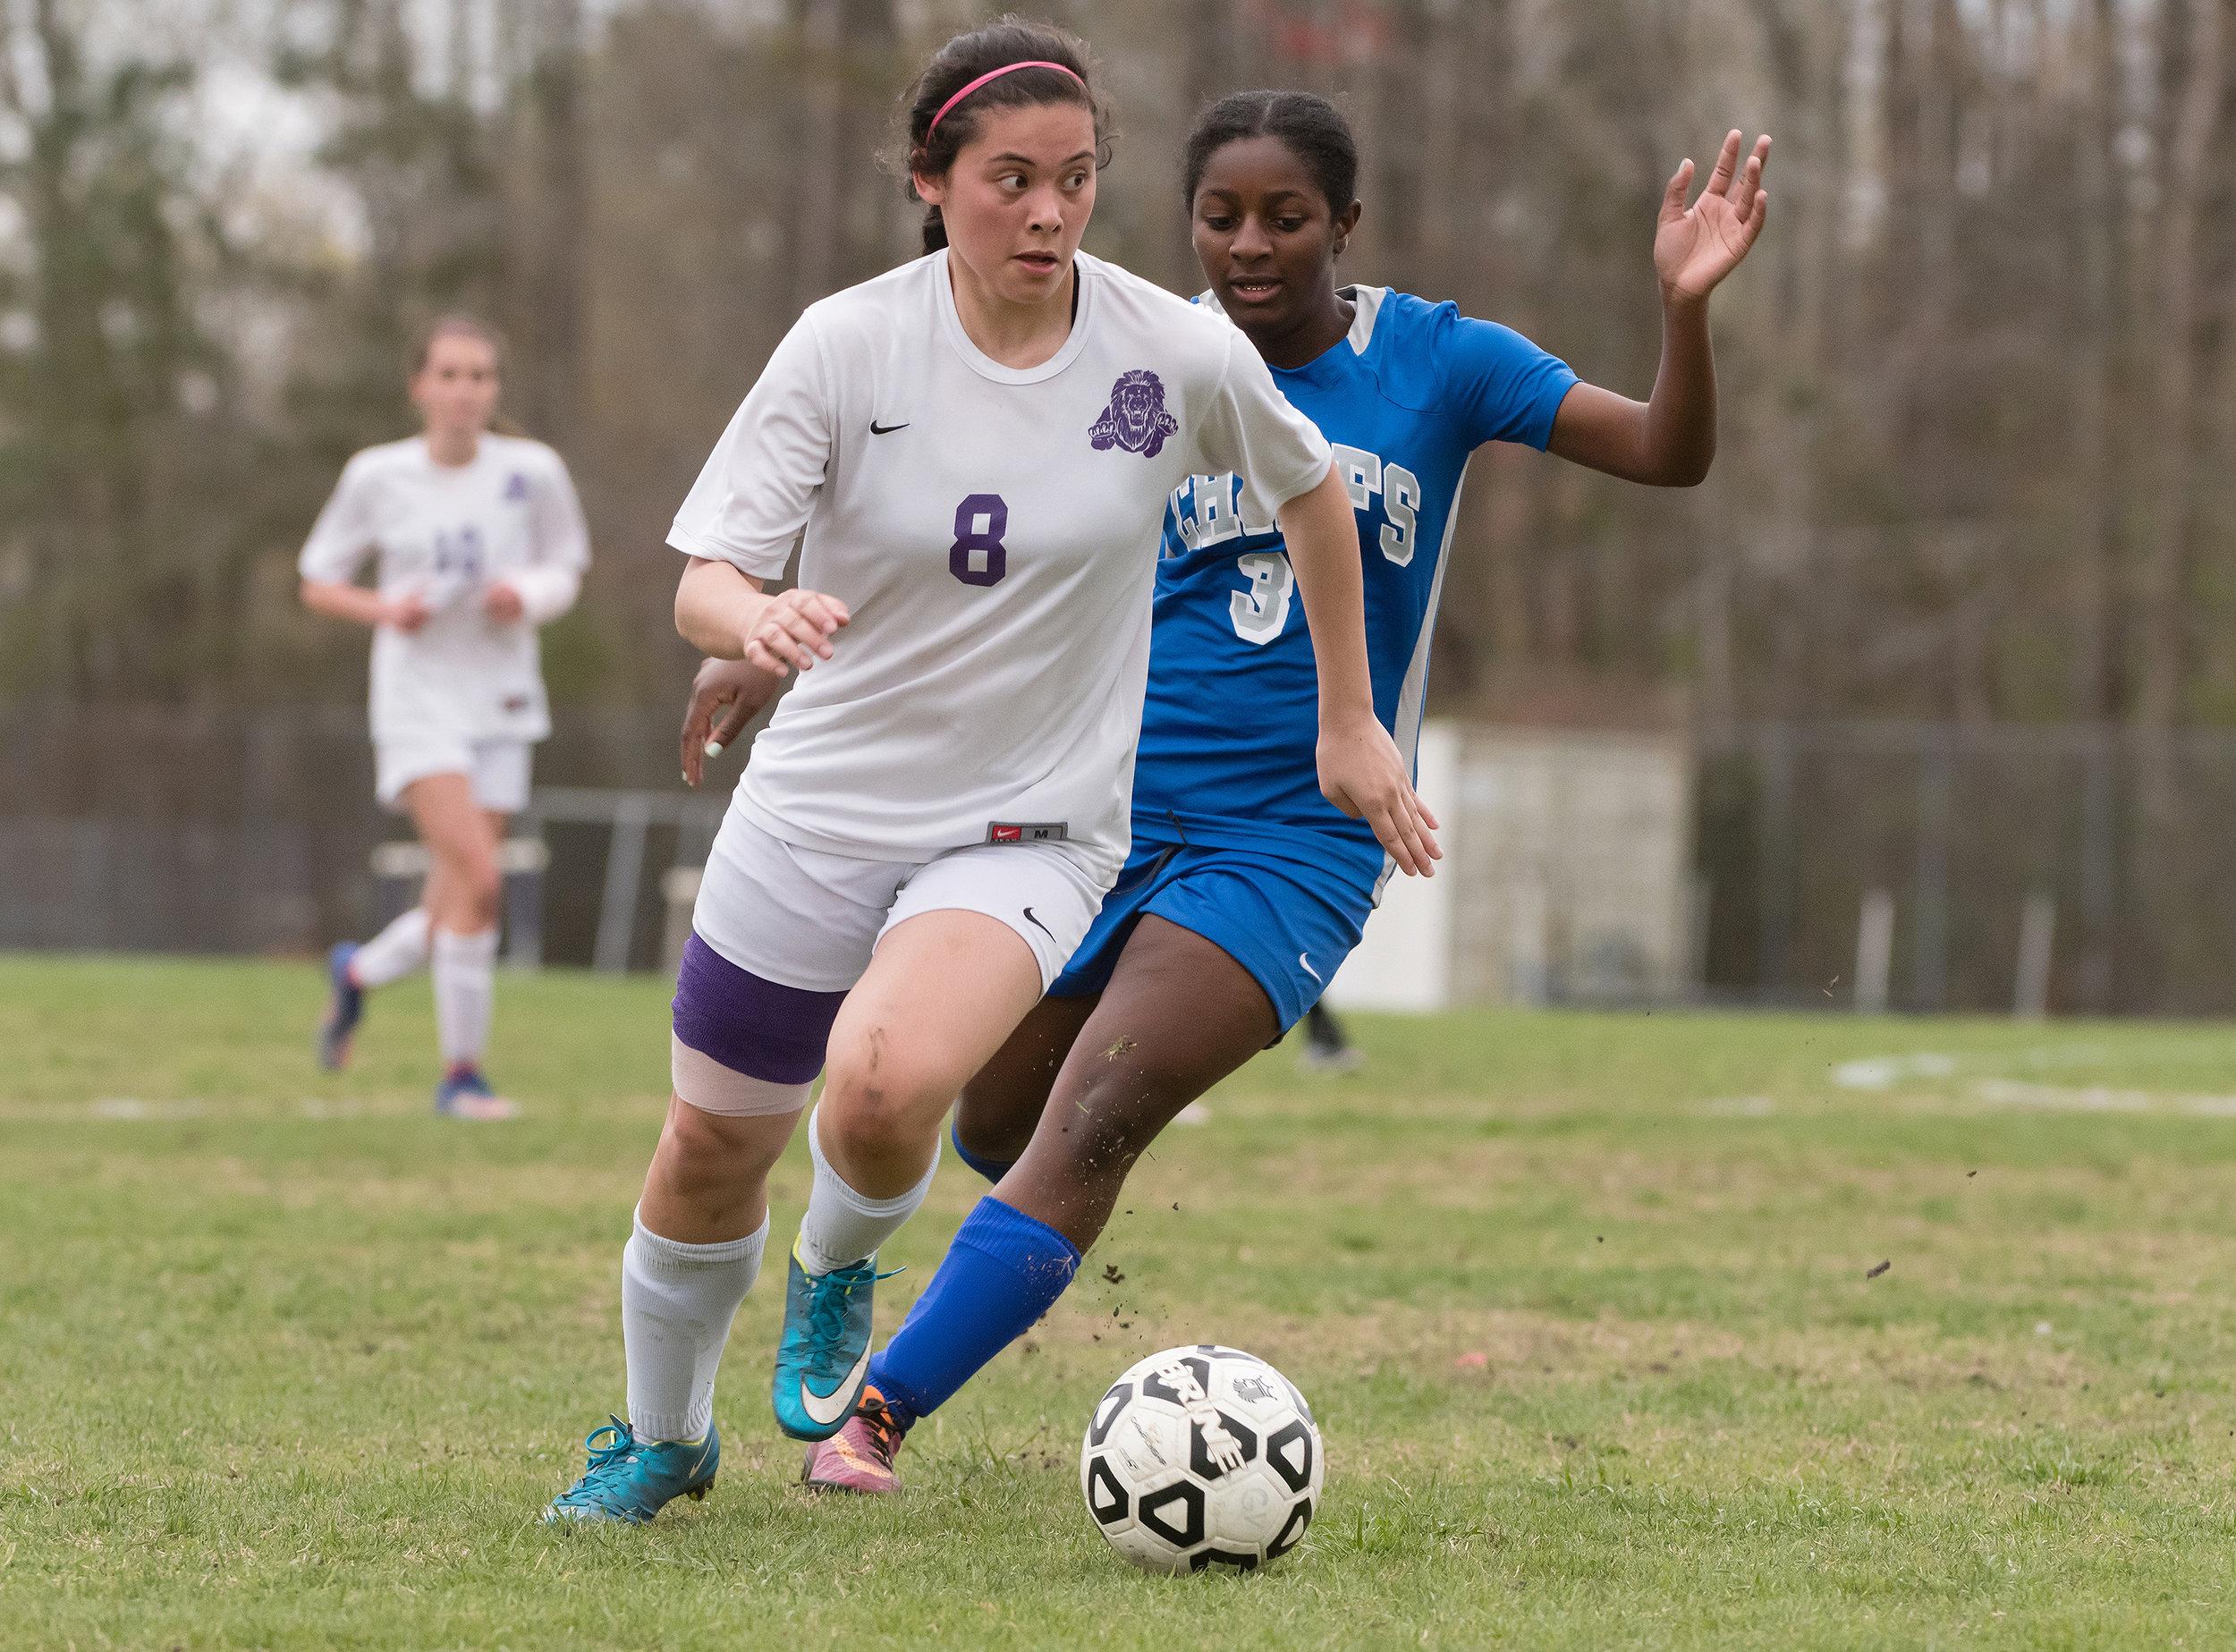 Tallwood defender Adriana Pemberton (8) moves the ball past Kempsville forward Mychael McKeever (3) during Monday night's game at Tallwood High School. Kempsville defeated Tallwood 2-0.